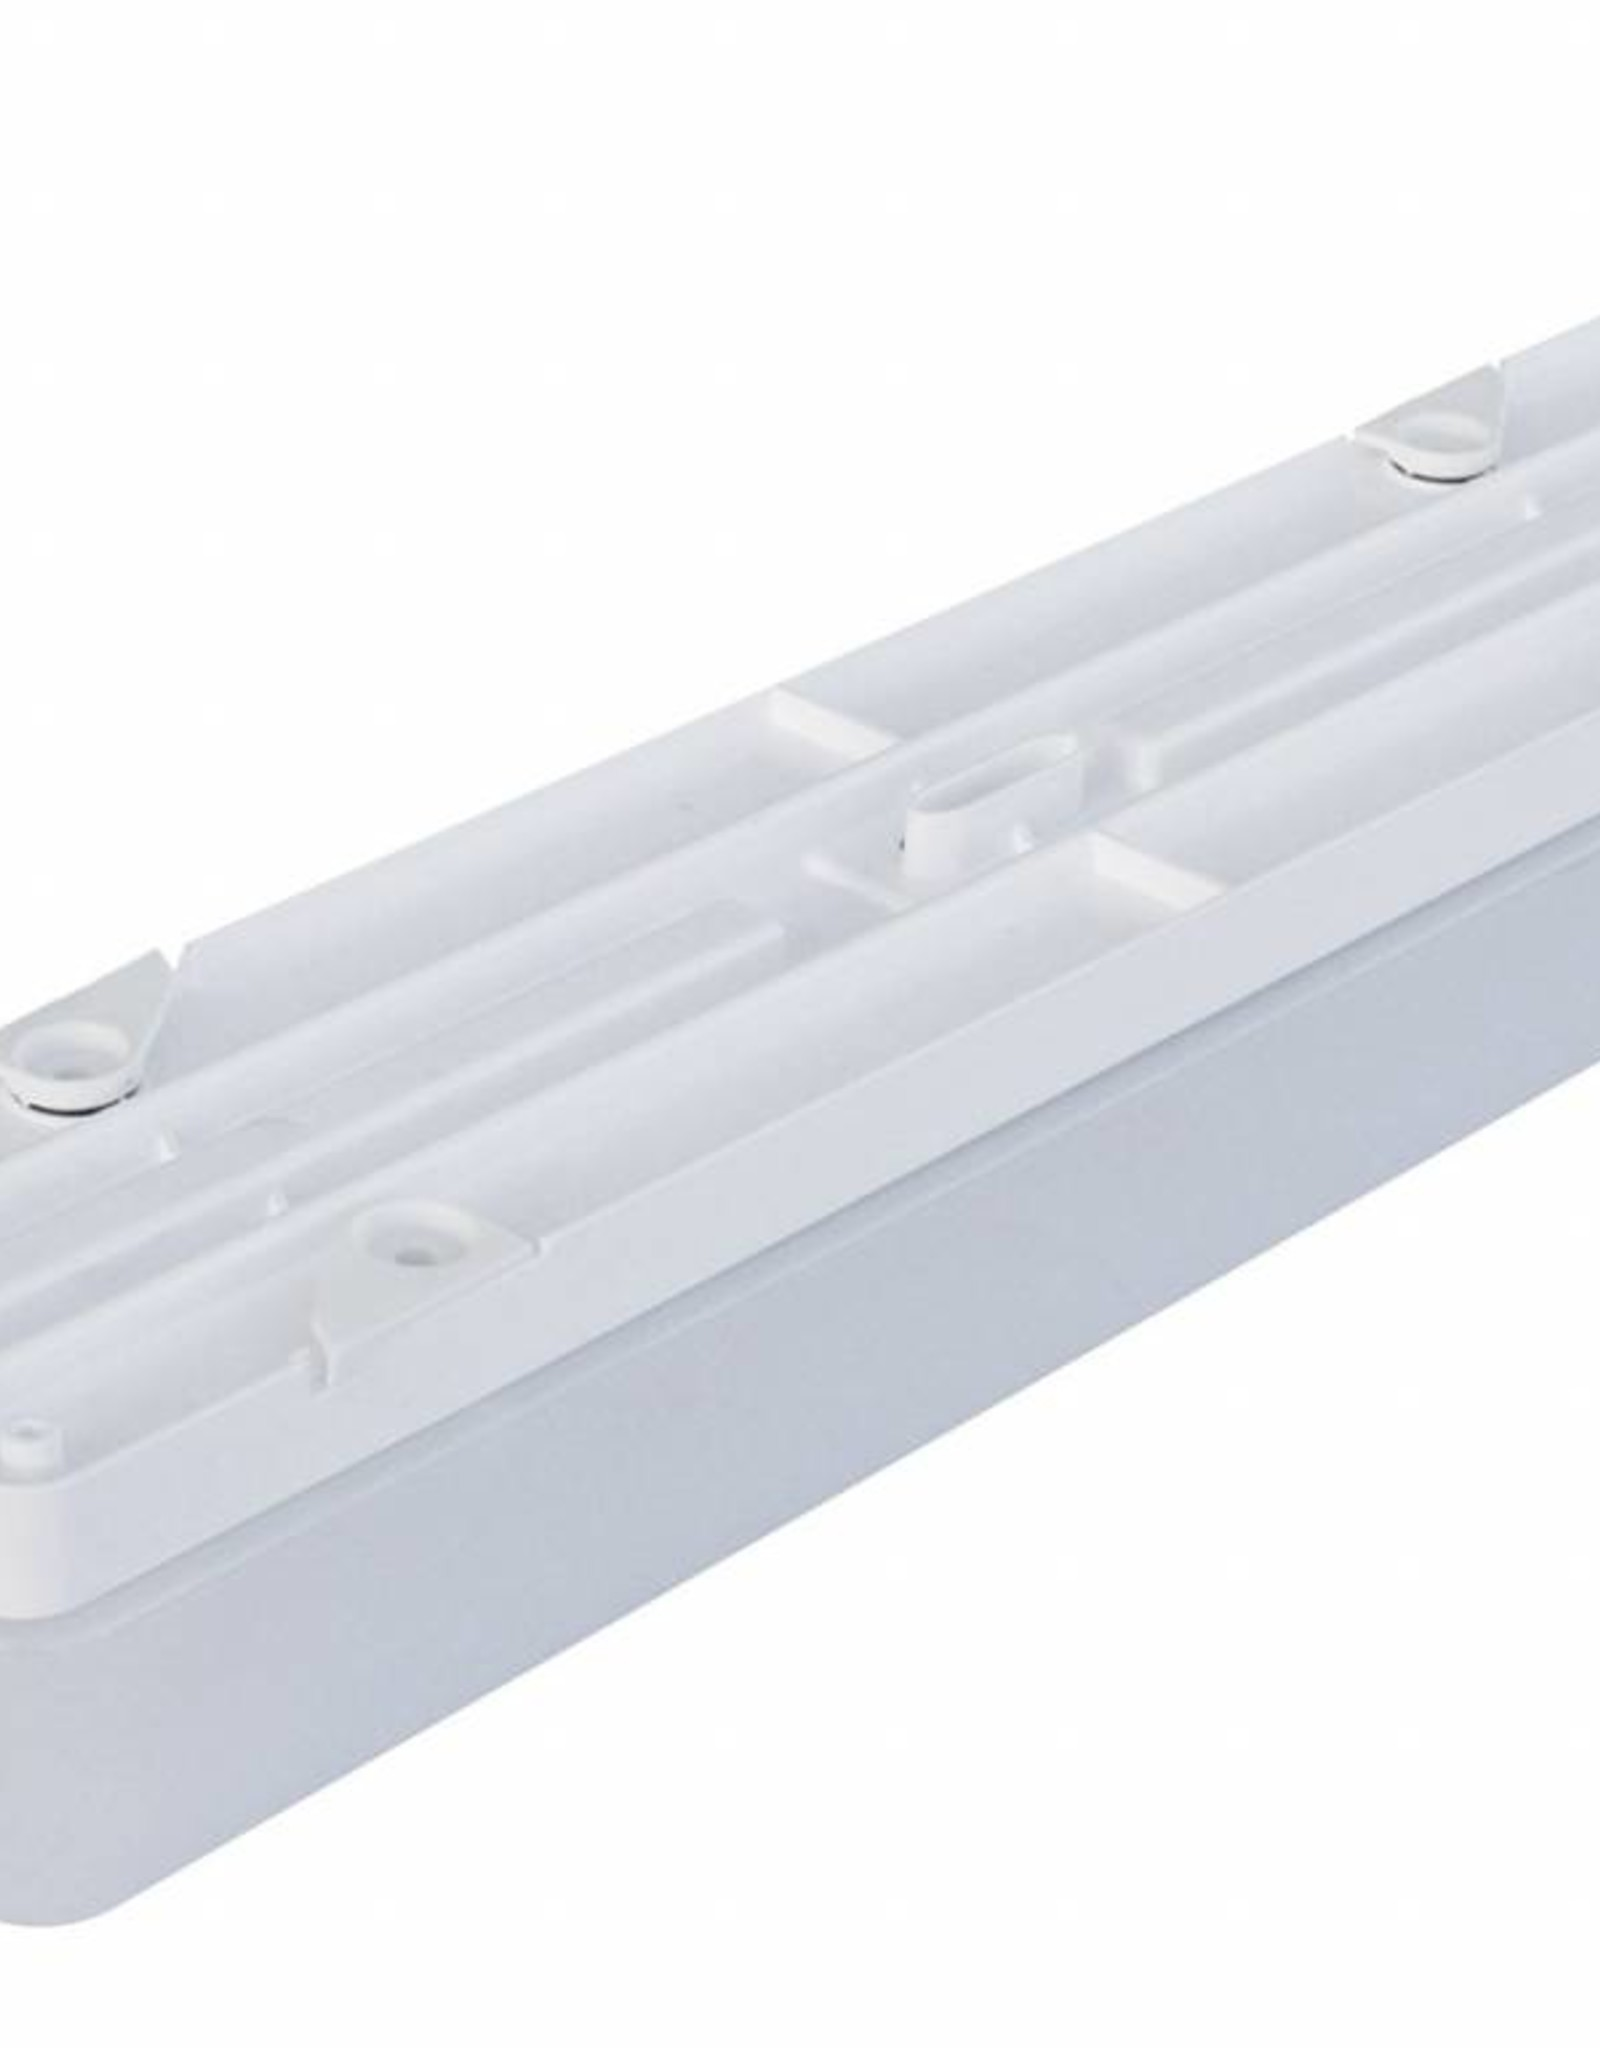 Linea 1.4ft 4400/840 DALI M1h